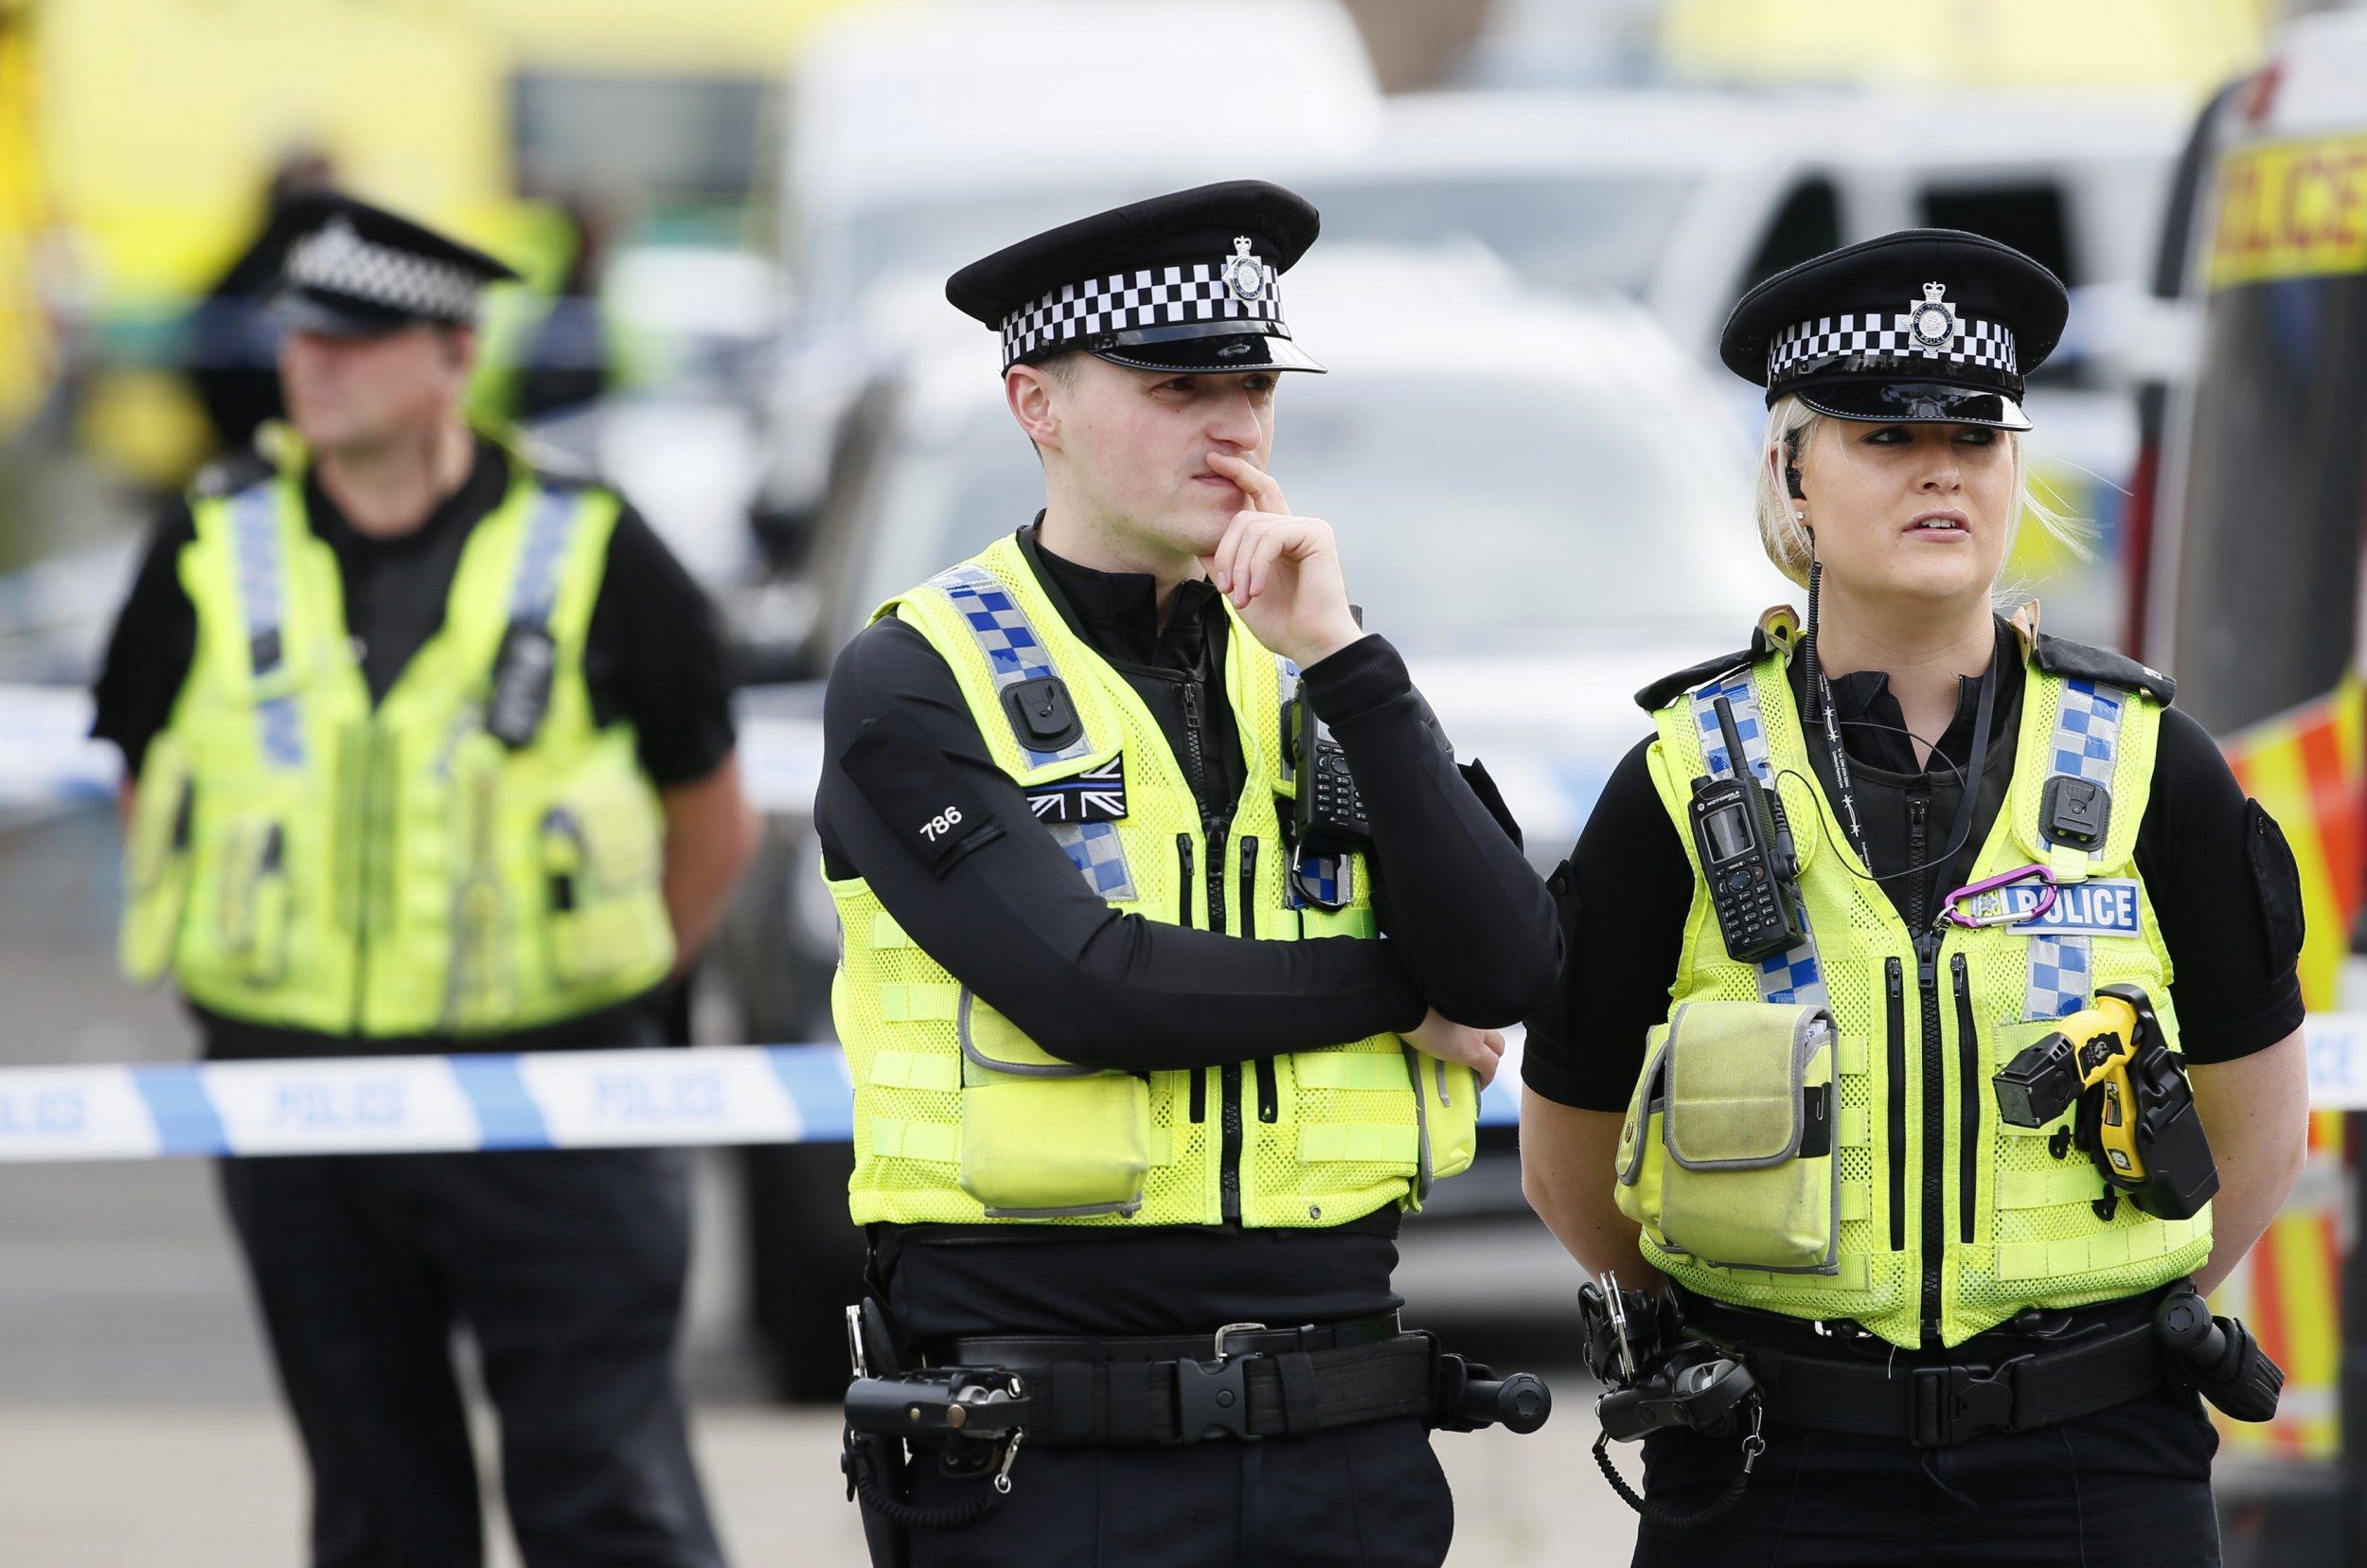 Police in Birstall